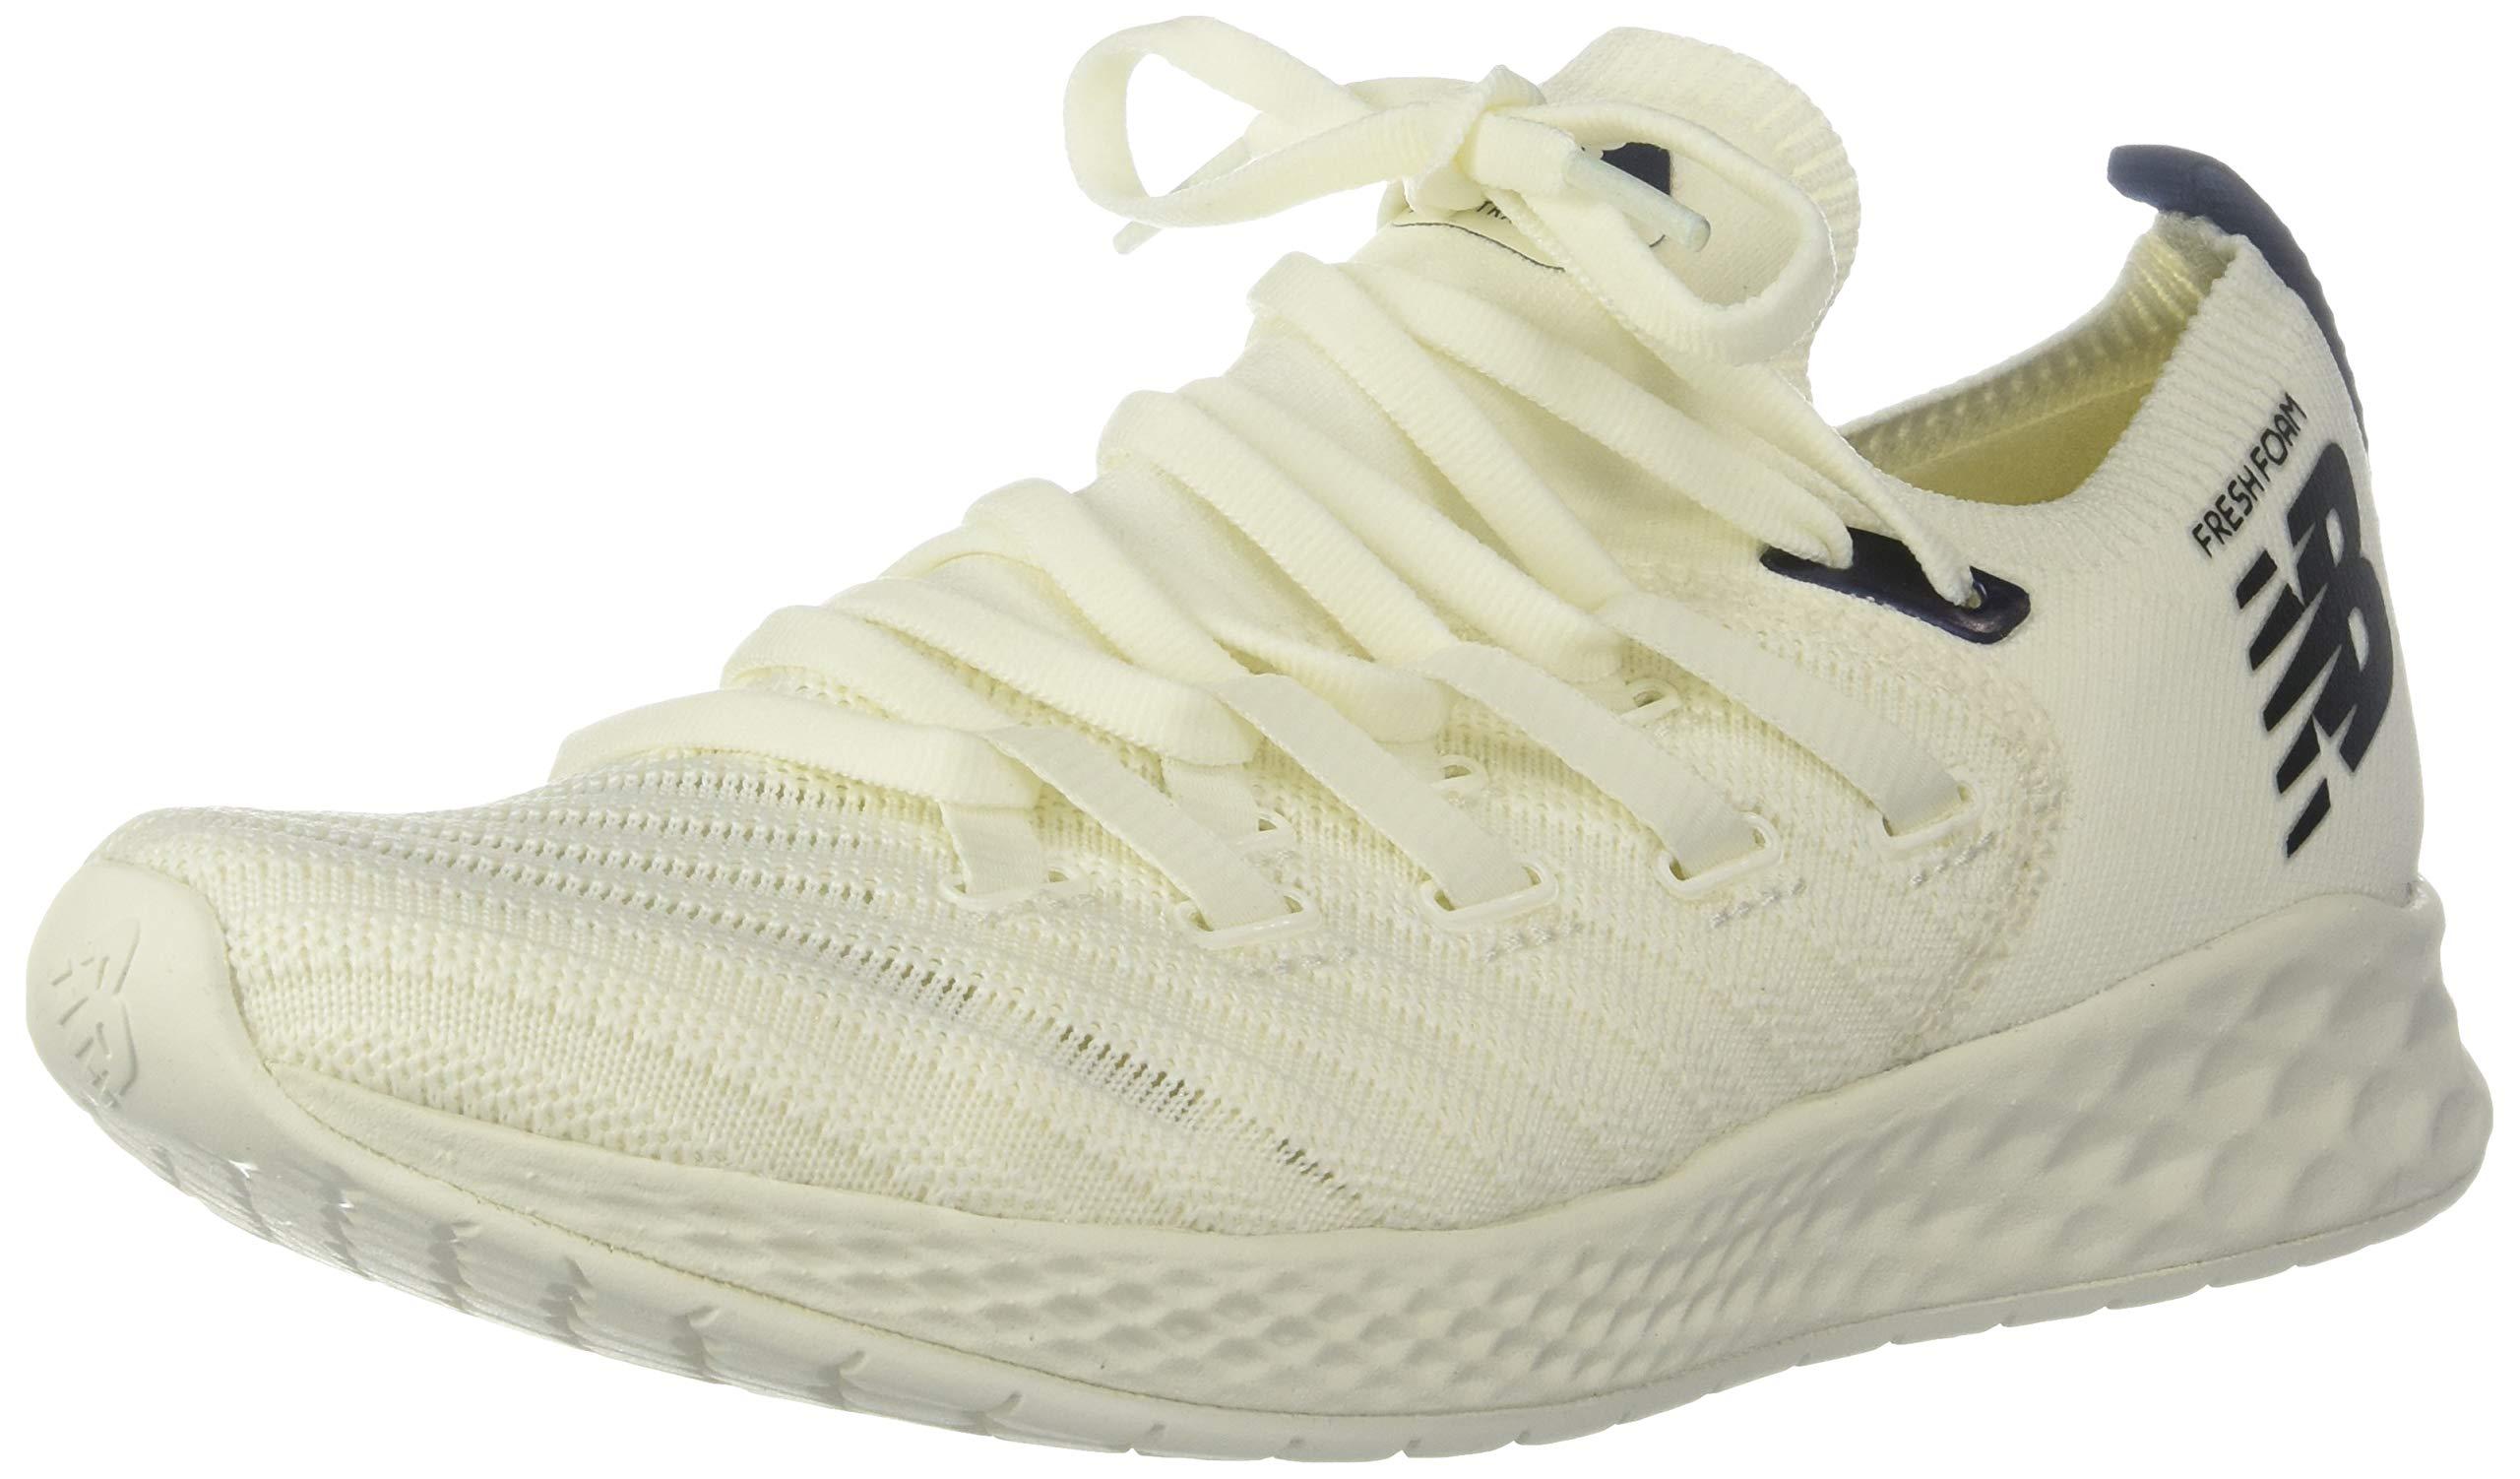 New Balance Women's Zante Trainer V1 Fresh Foam Running Shoe, SEA Salt/Pigment, 5 M US